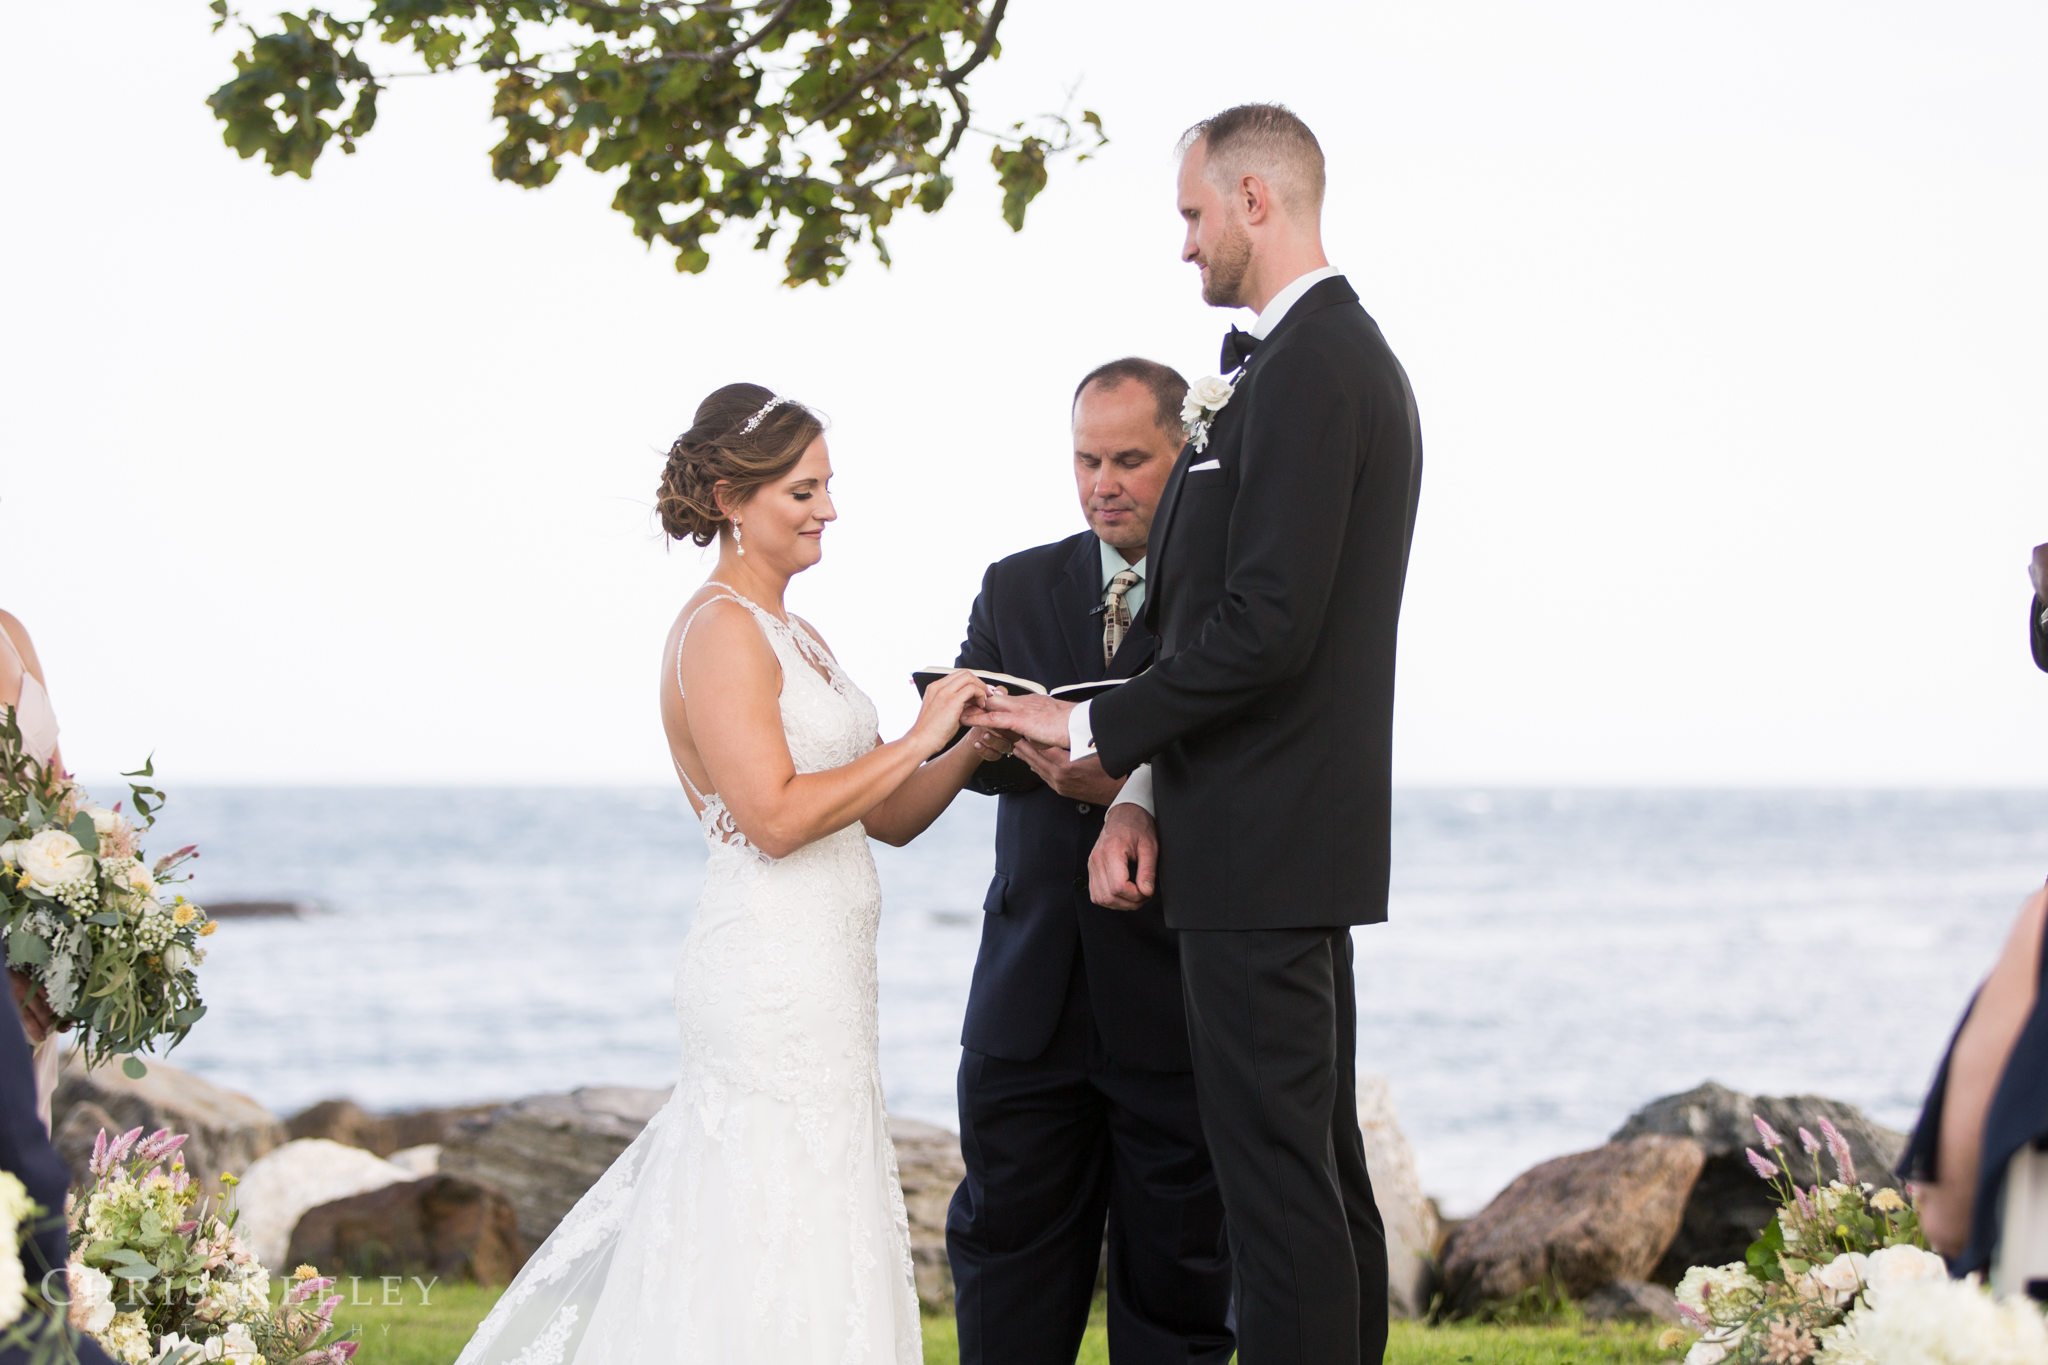 mombo-portsmouth-new-hampshire-wedding-photograper-41.jpg